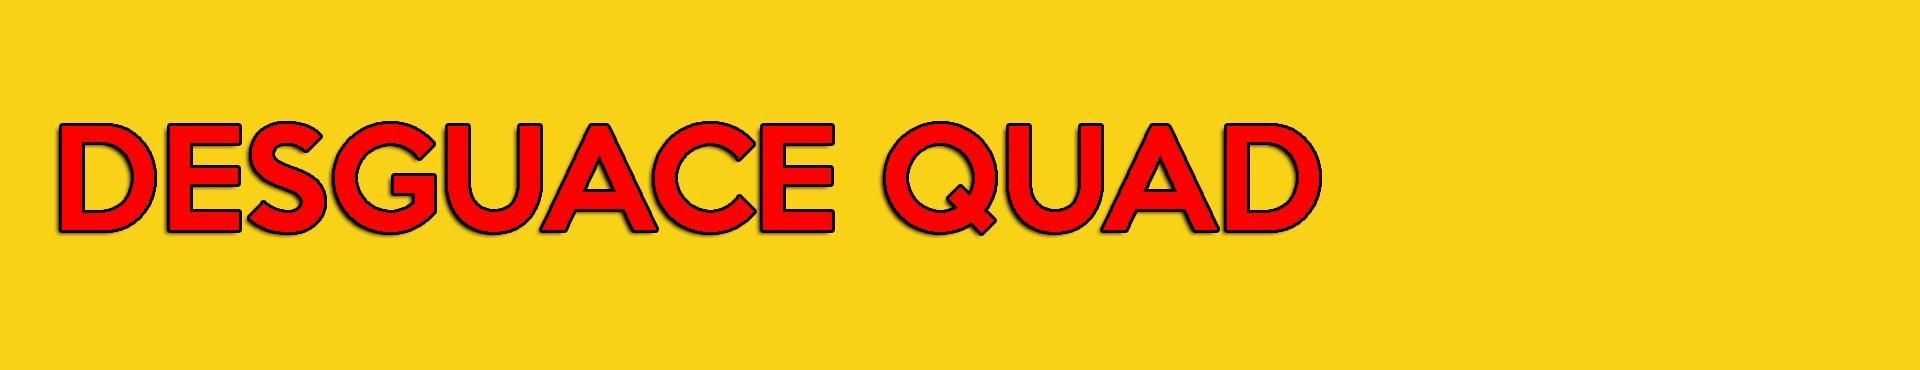 Desguace de Quad. Encuentra la pieza que buscas para tu quad.